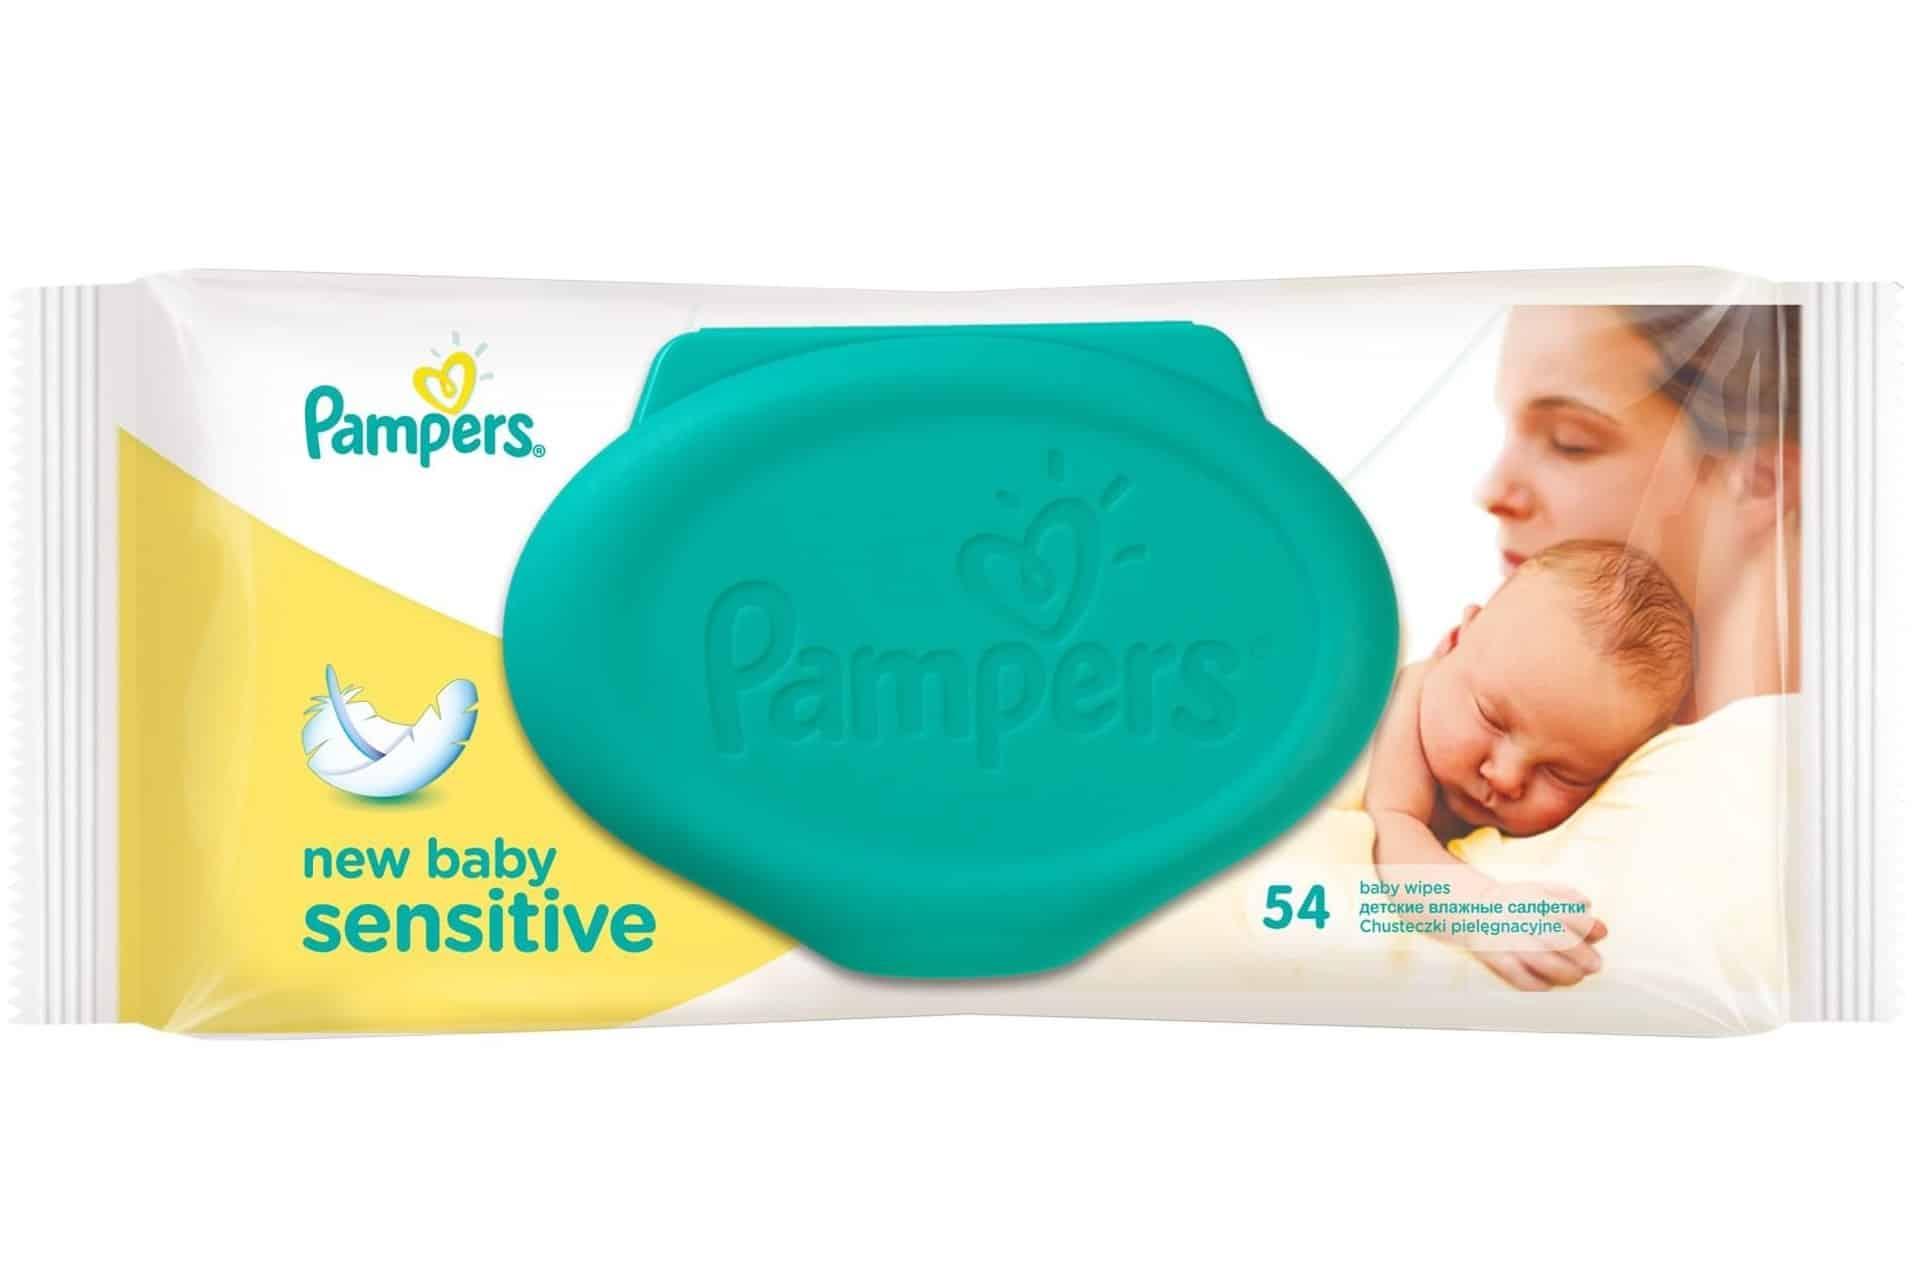 Pampers New Baby Sensitive, chusteczki nawilżane, Matka Aptekarka